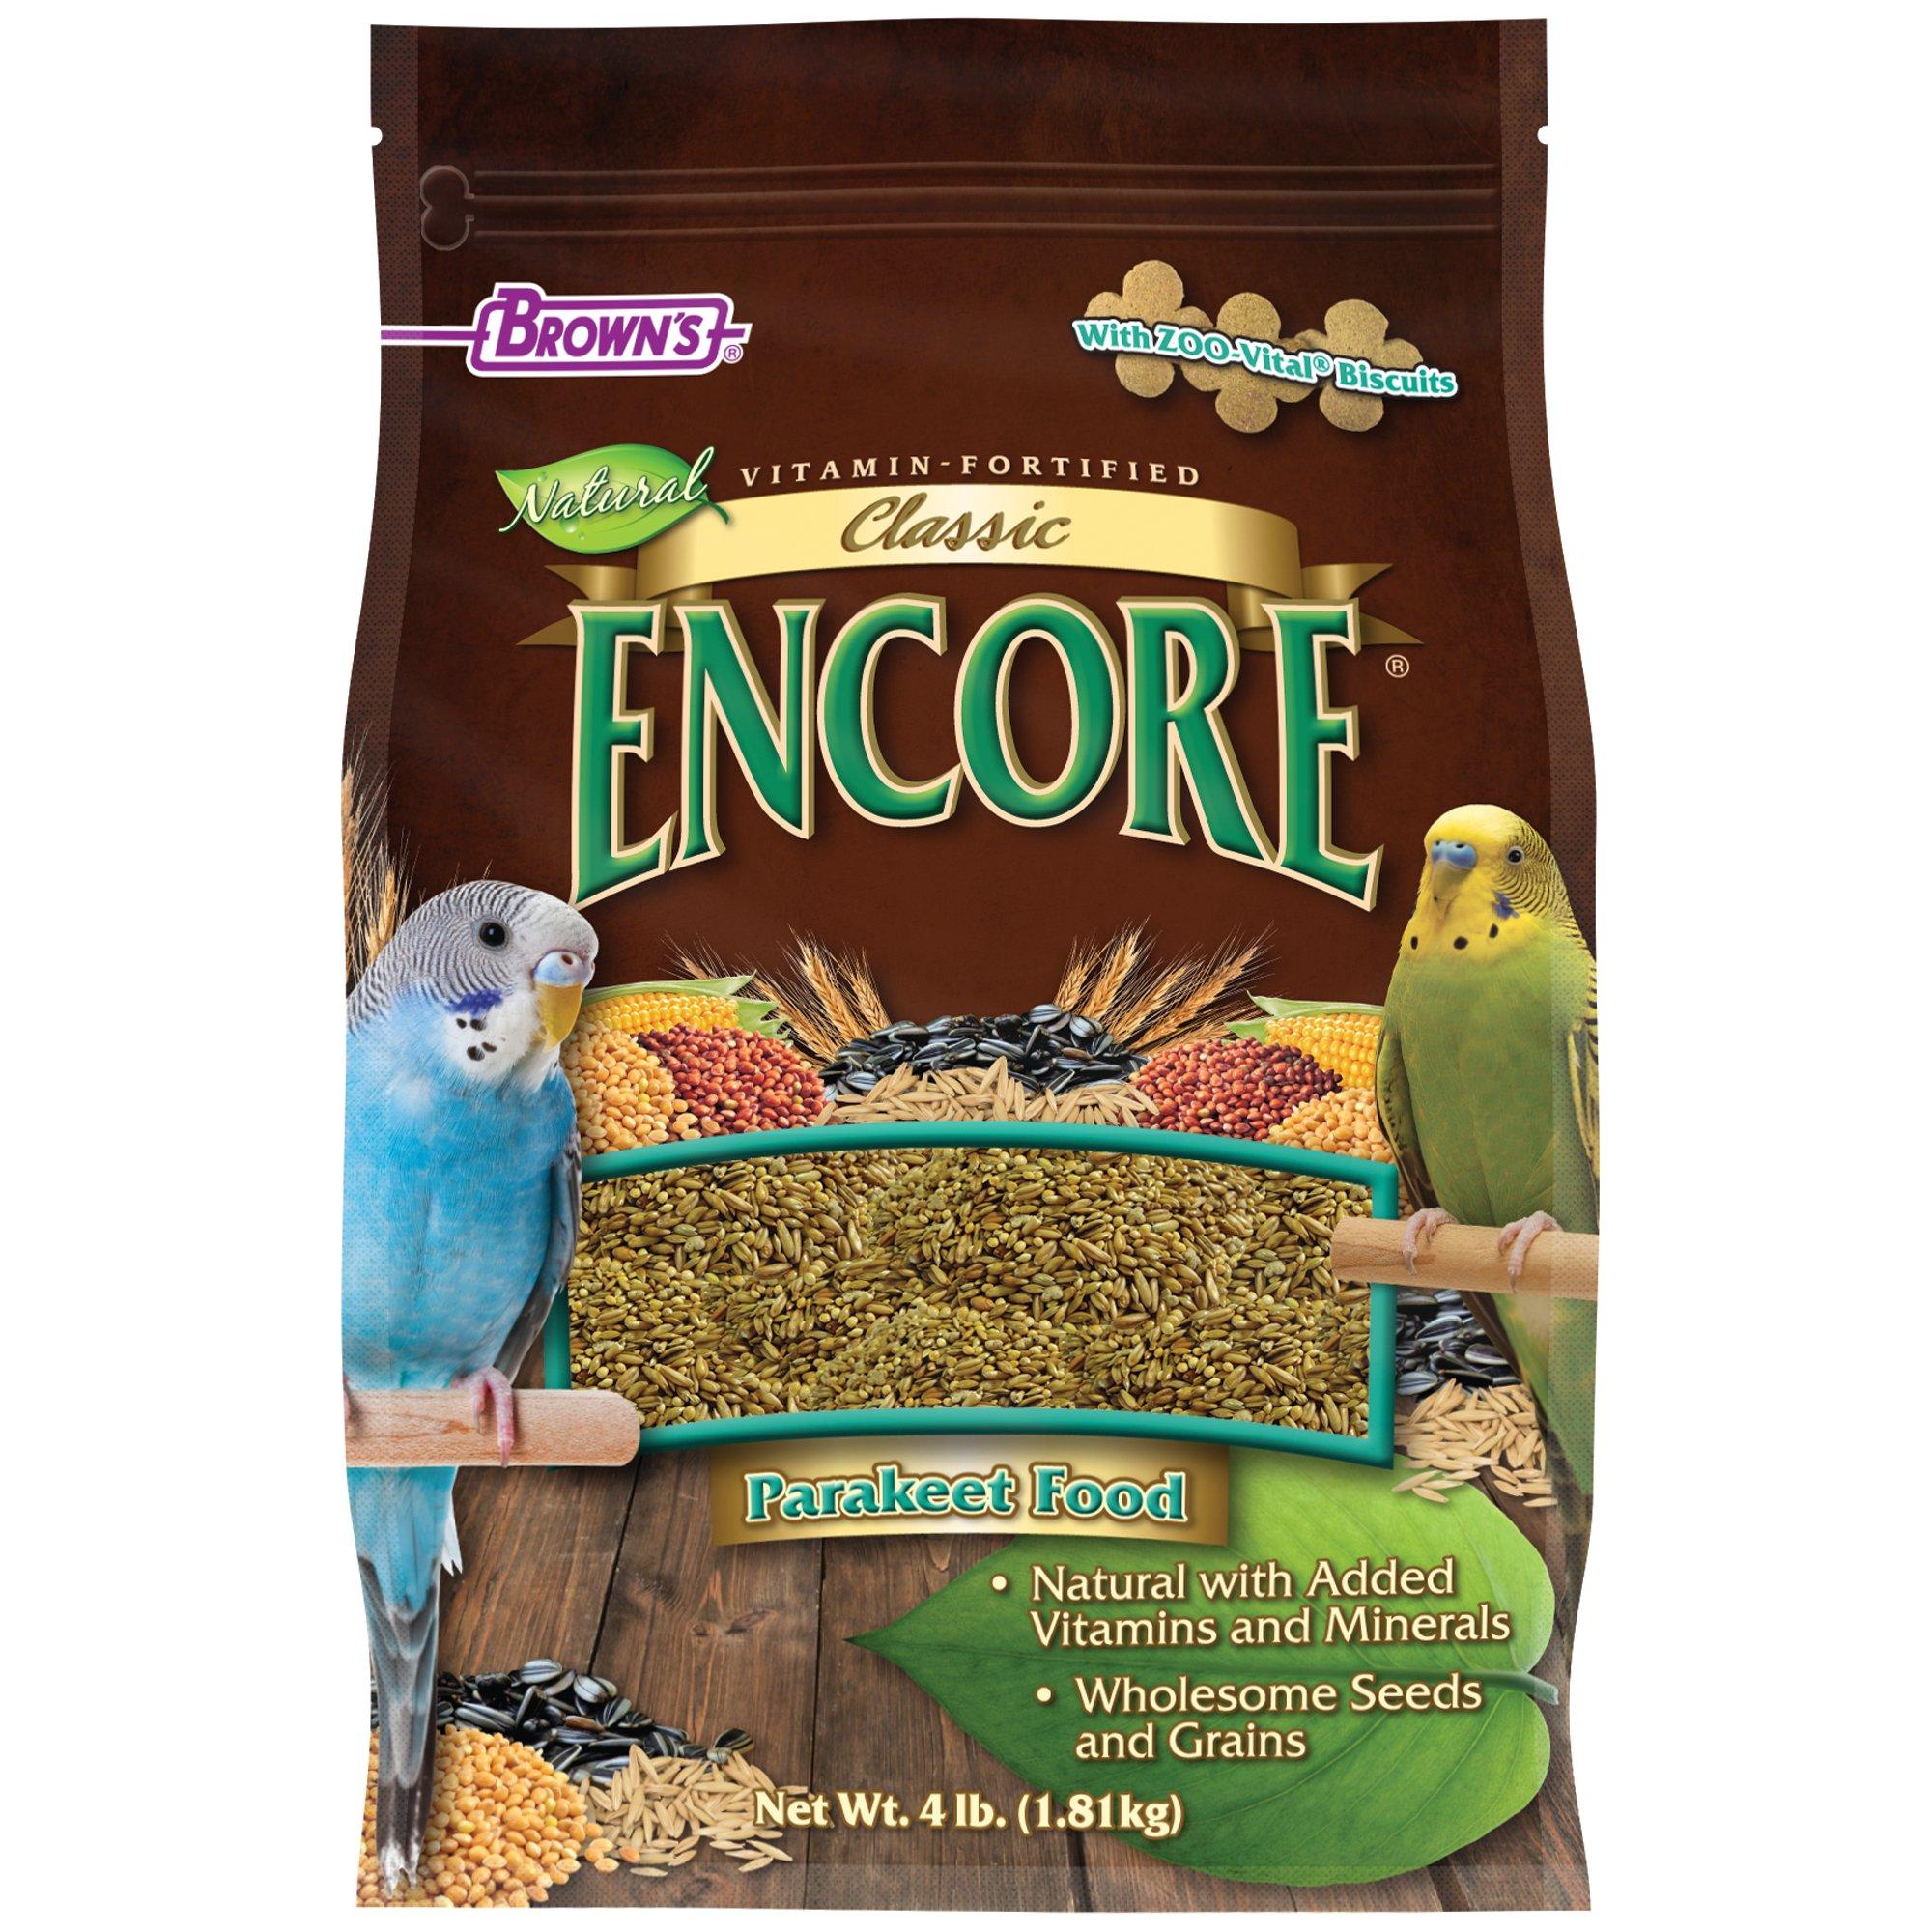 Brown's Encore Classic Parakeet Food